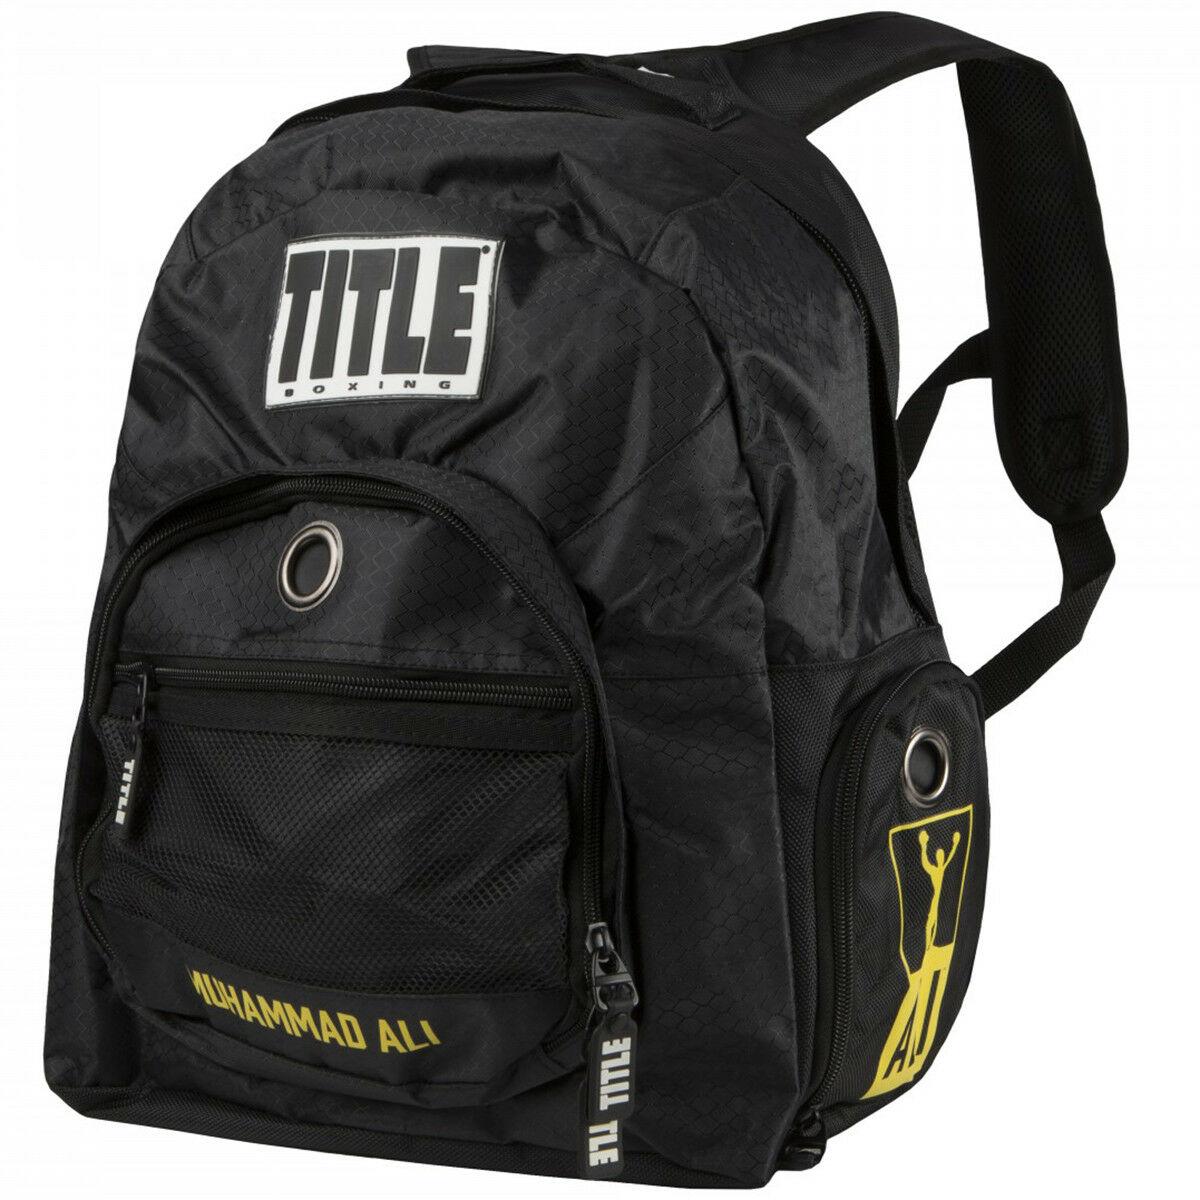 Title Boxing Muhammad Ali Super Equipment Backpack